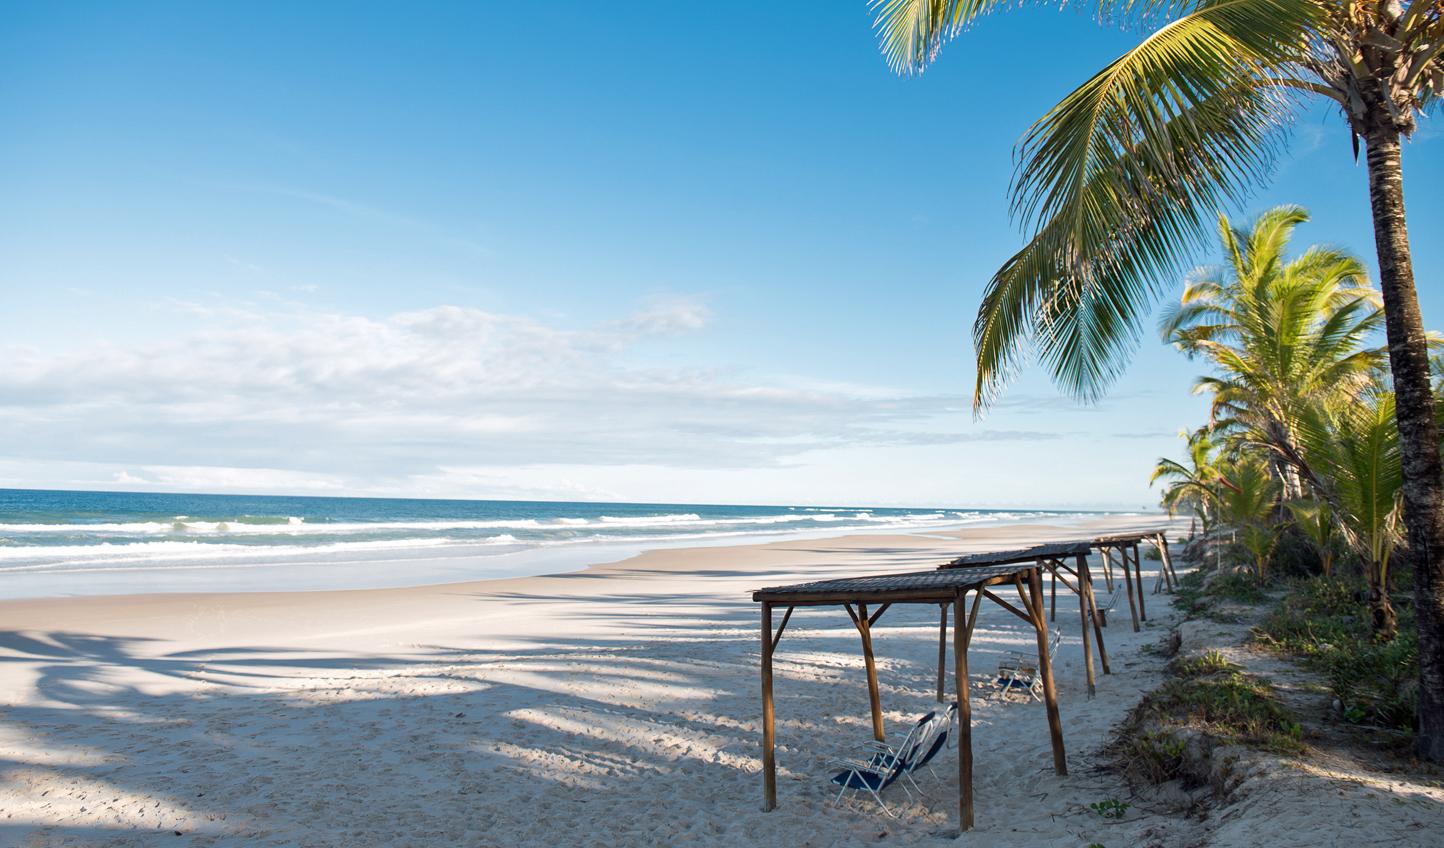 A peaceful morning on the beach